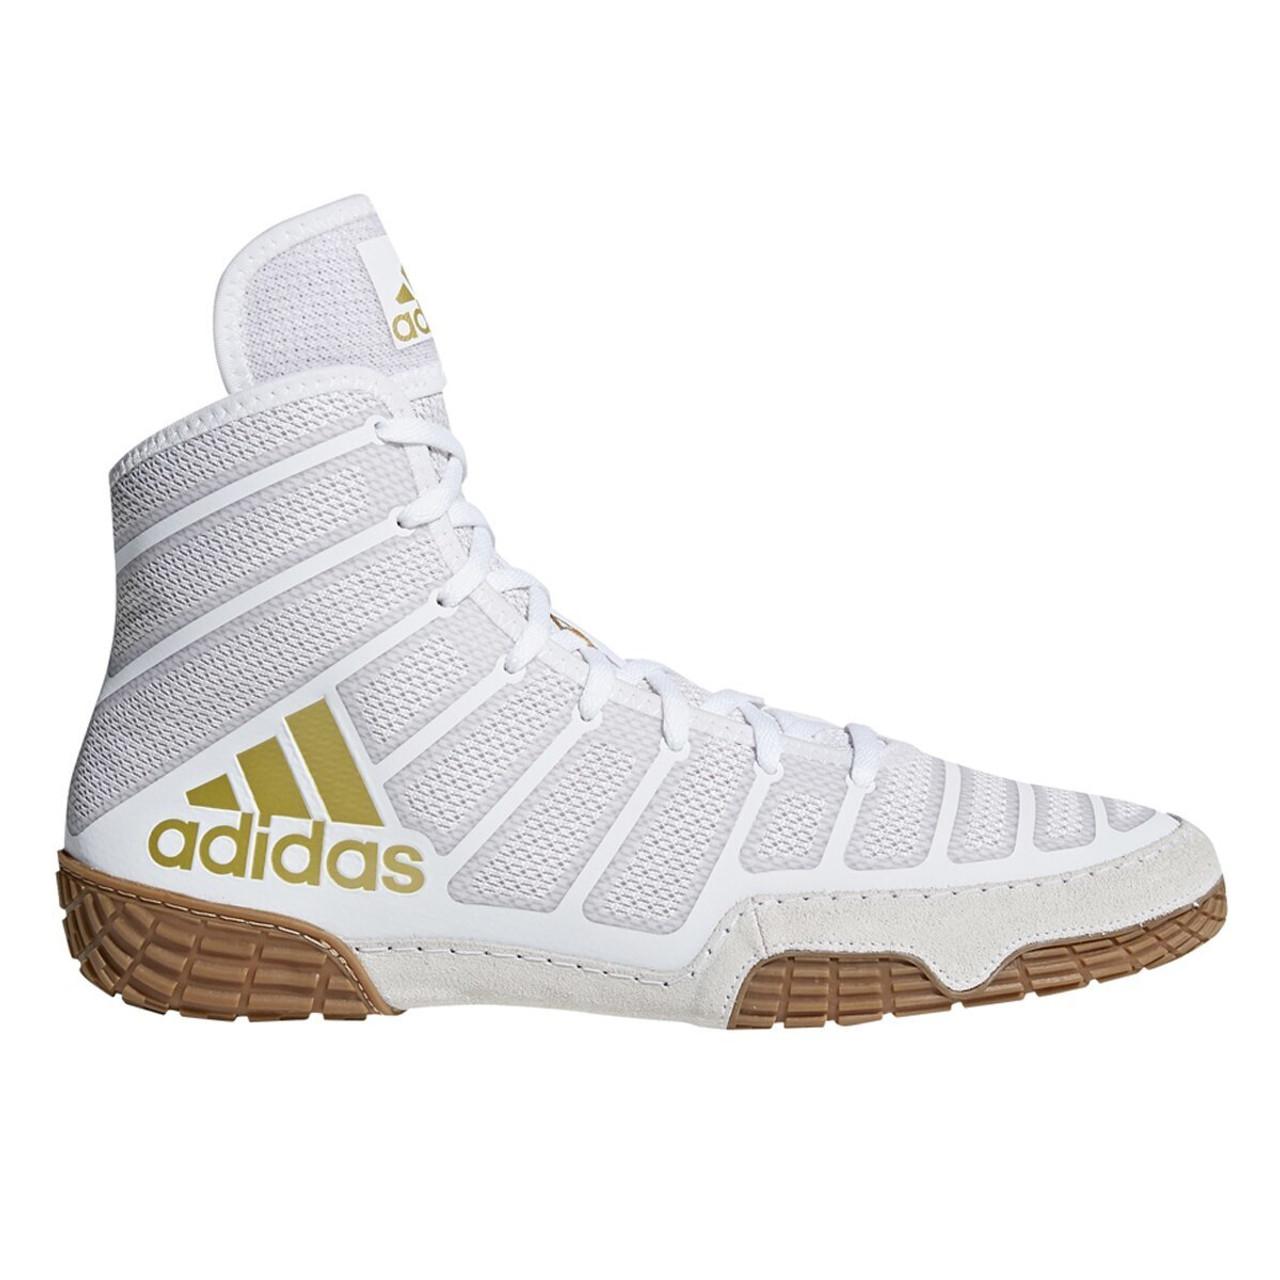 silbar galope blanco lechoso  Adidas Adizero Varner Adult Wrestling Shoes DA9891 - White, Gold